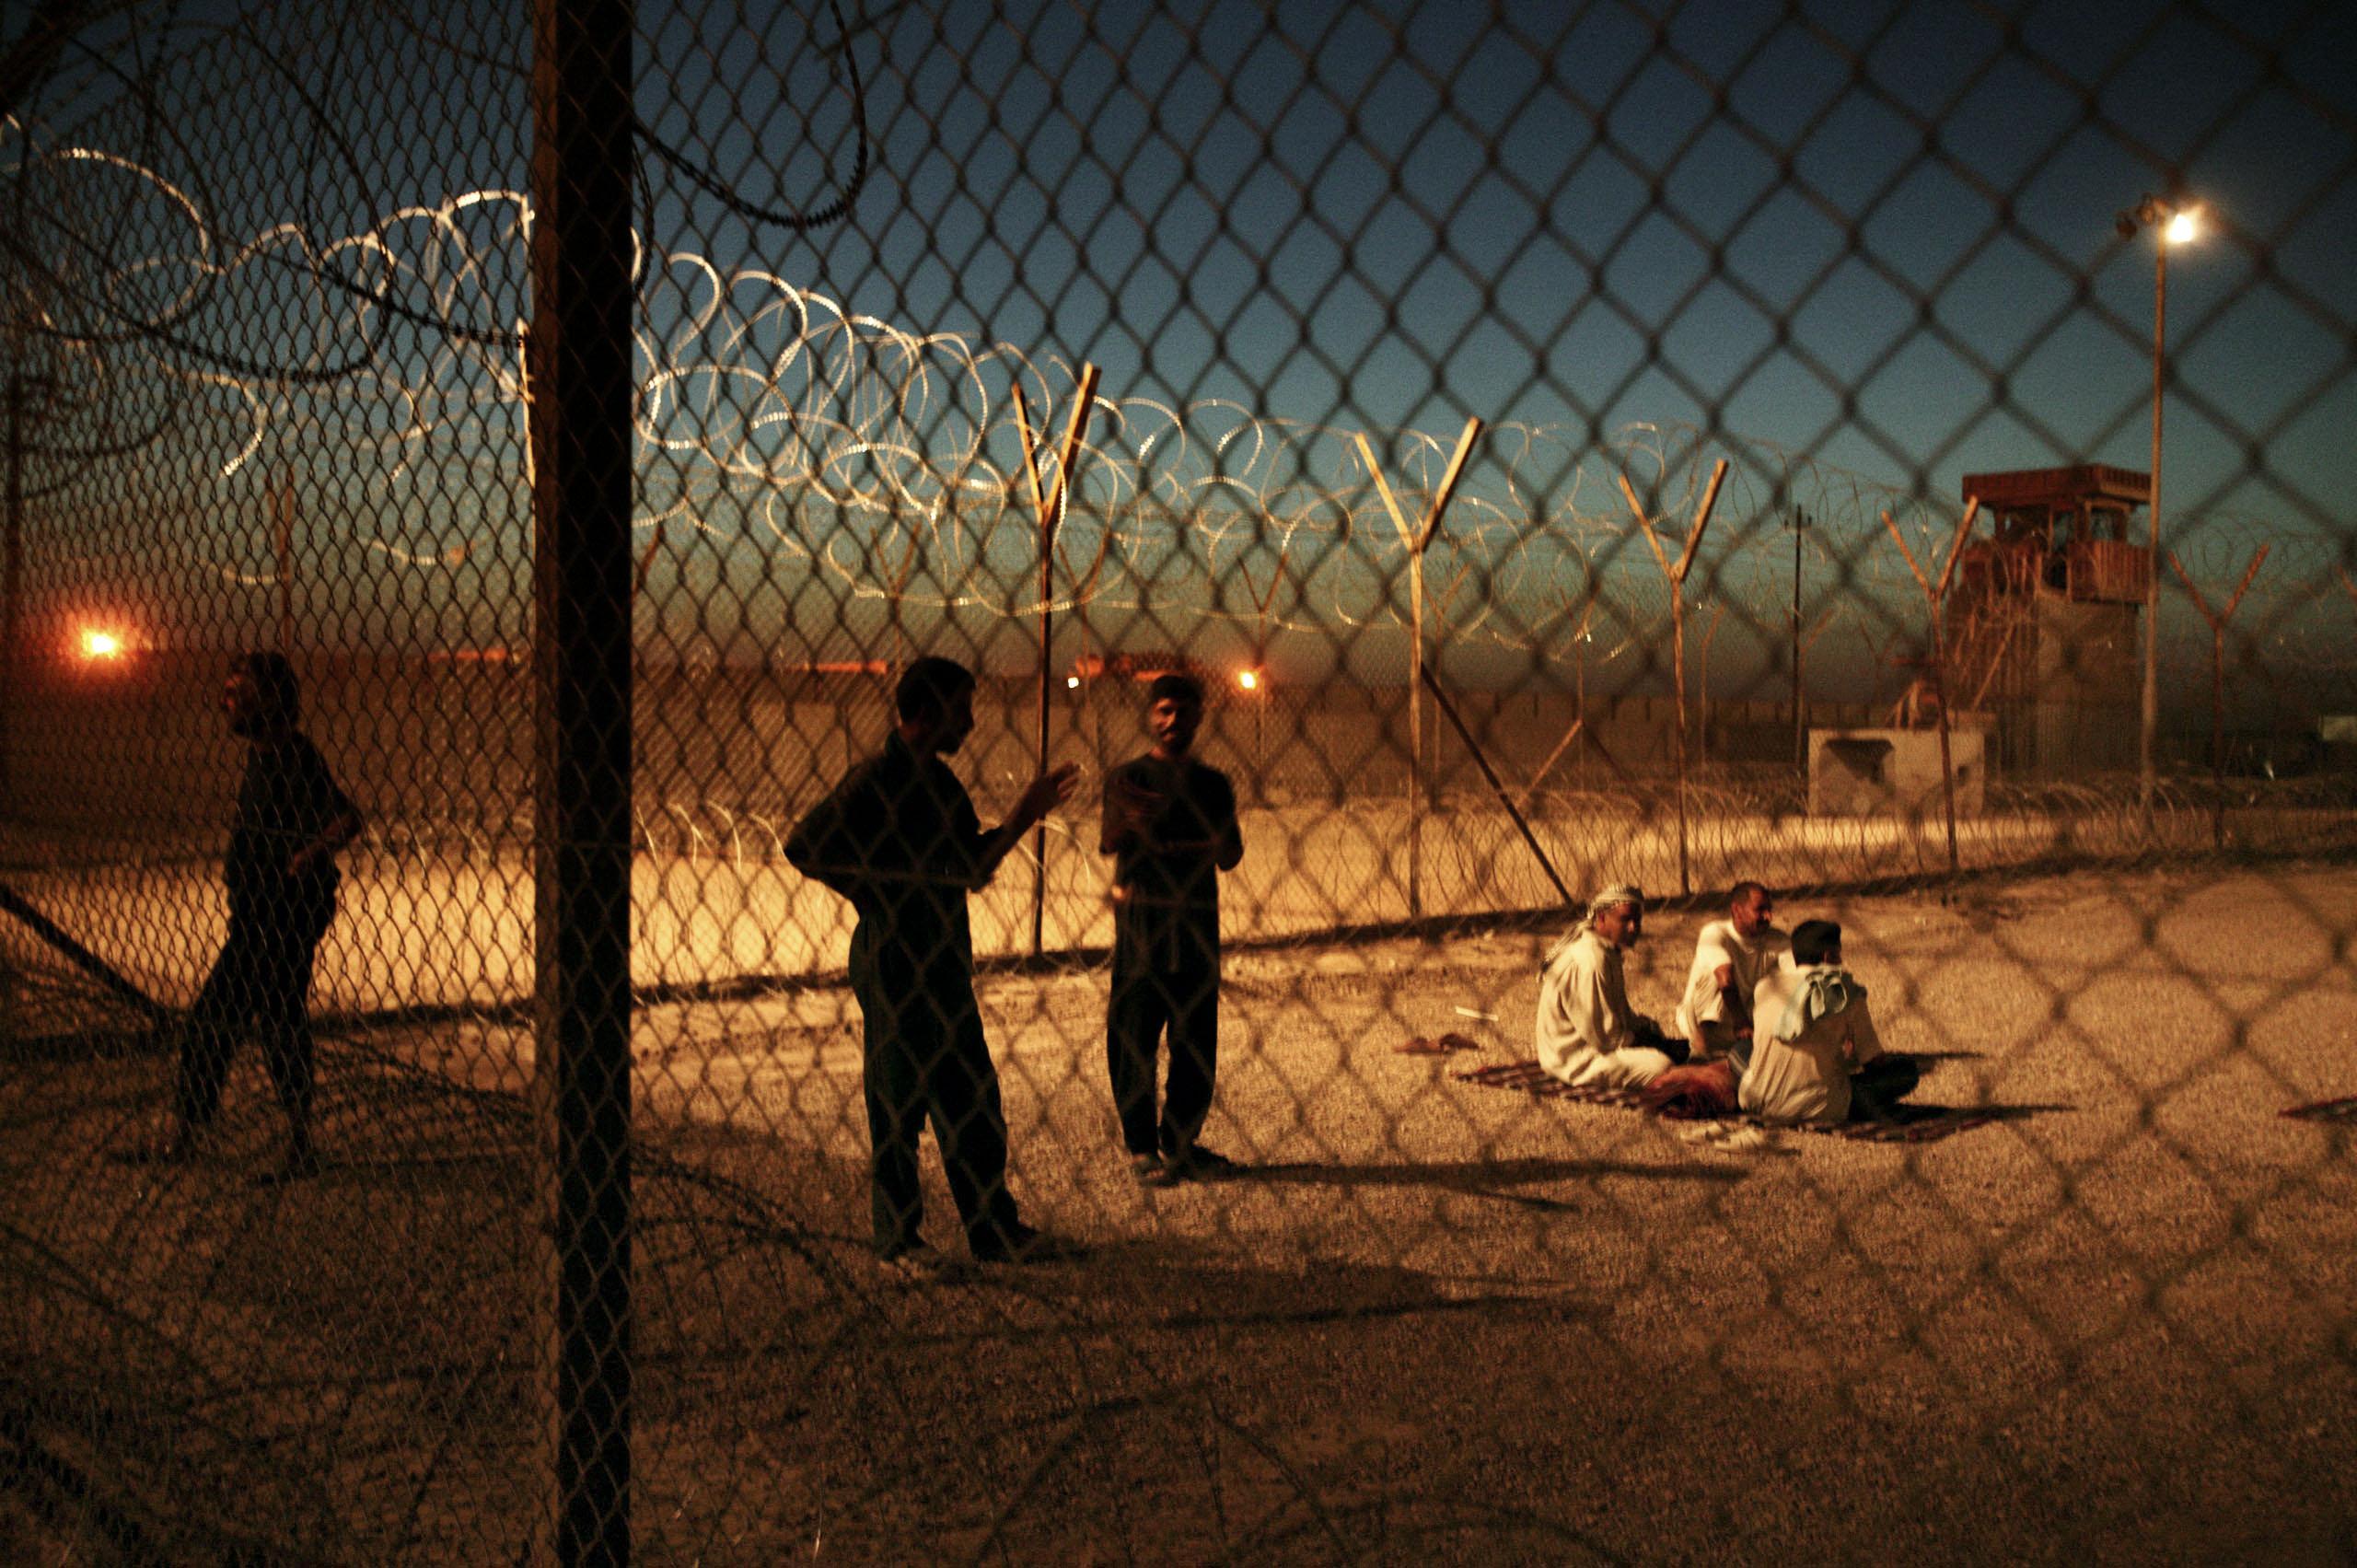 Iraqi detainees in Abu Ghraib prison, Baghdad, Iraq, June 25, 2004.